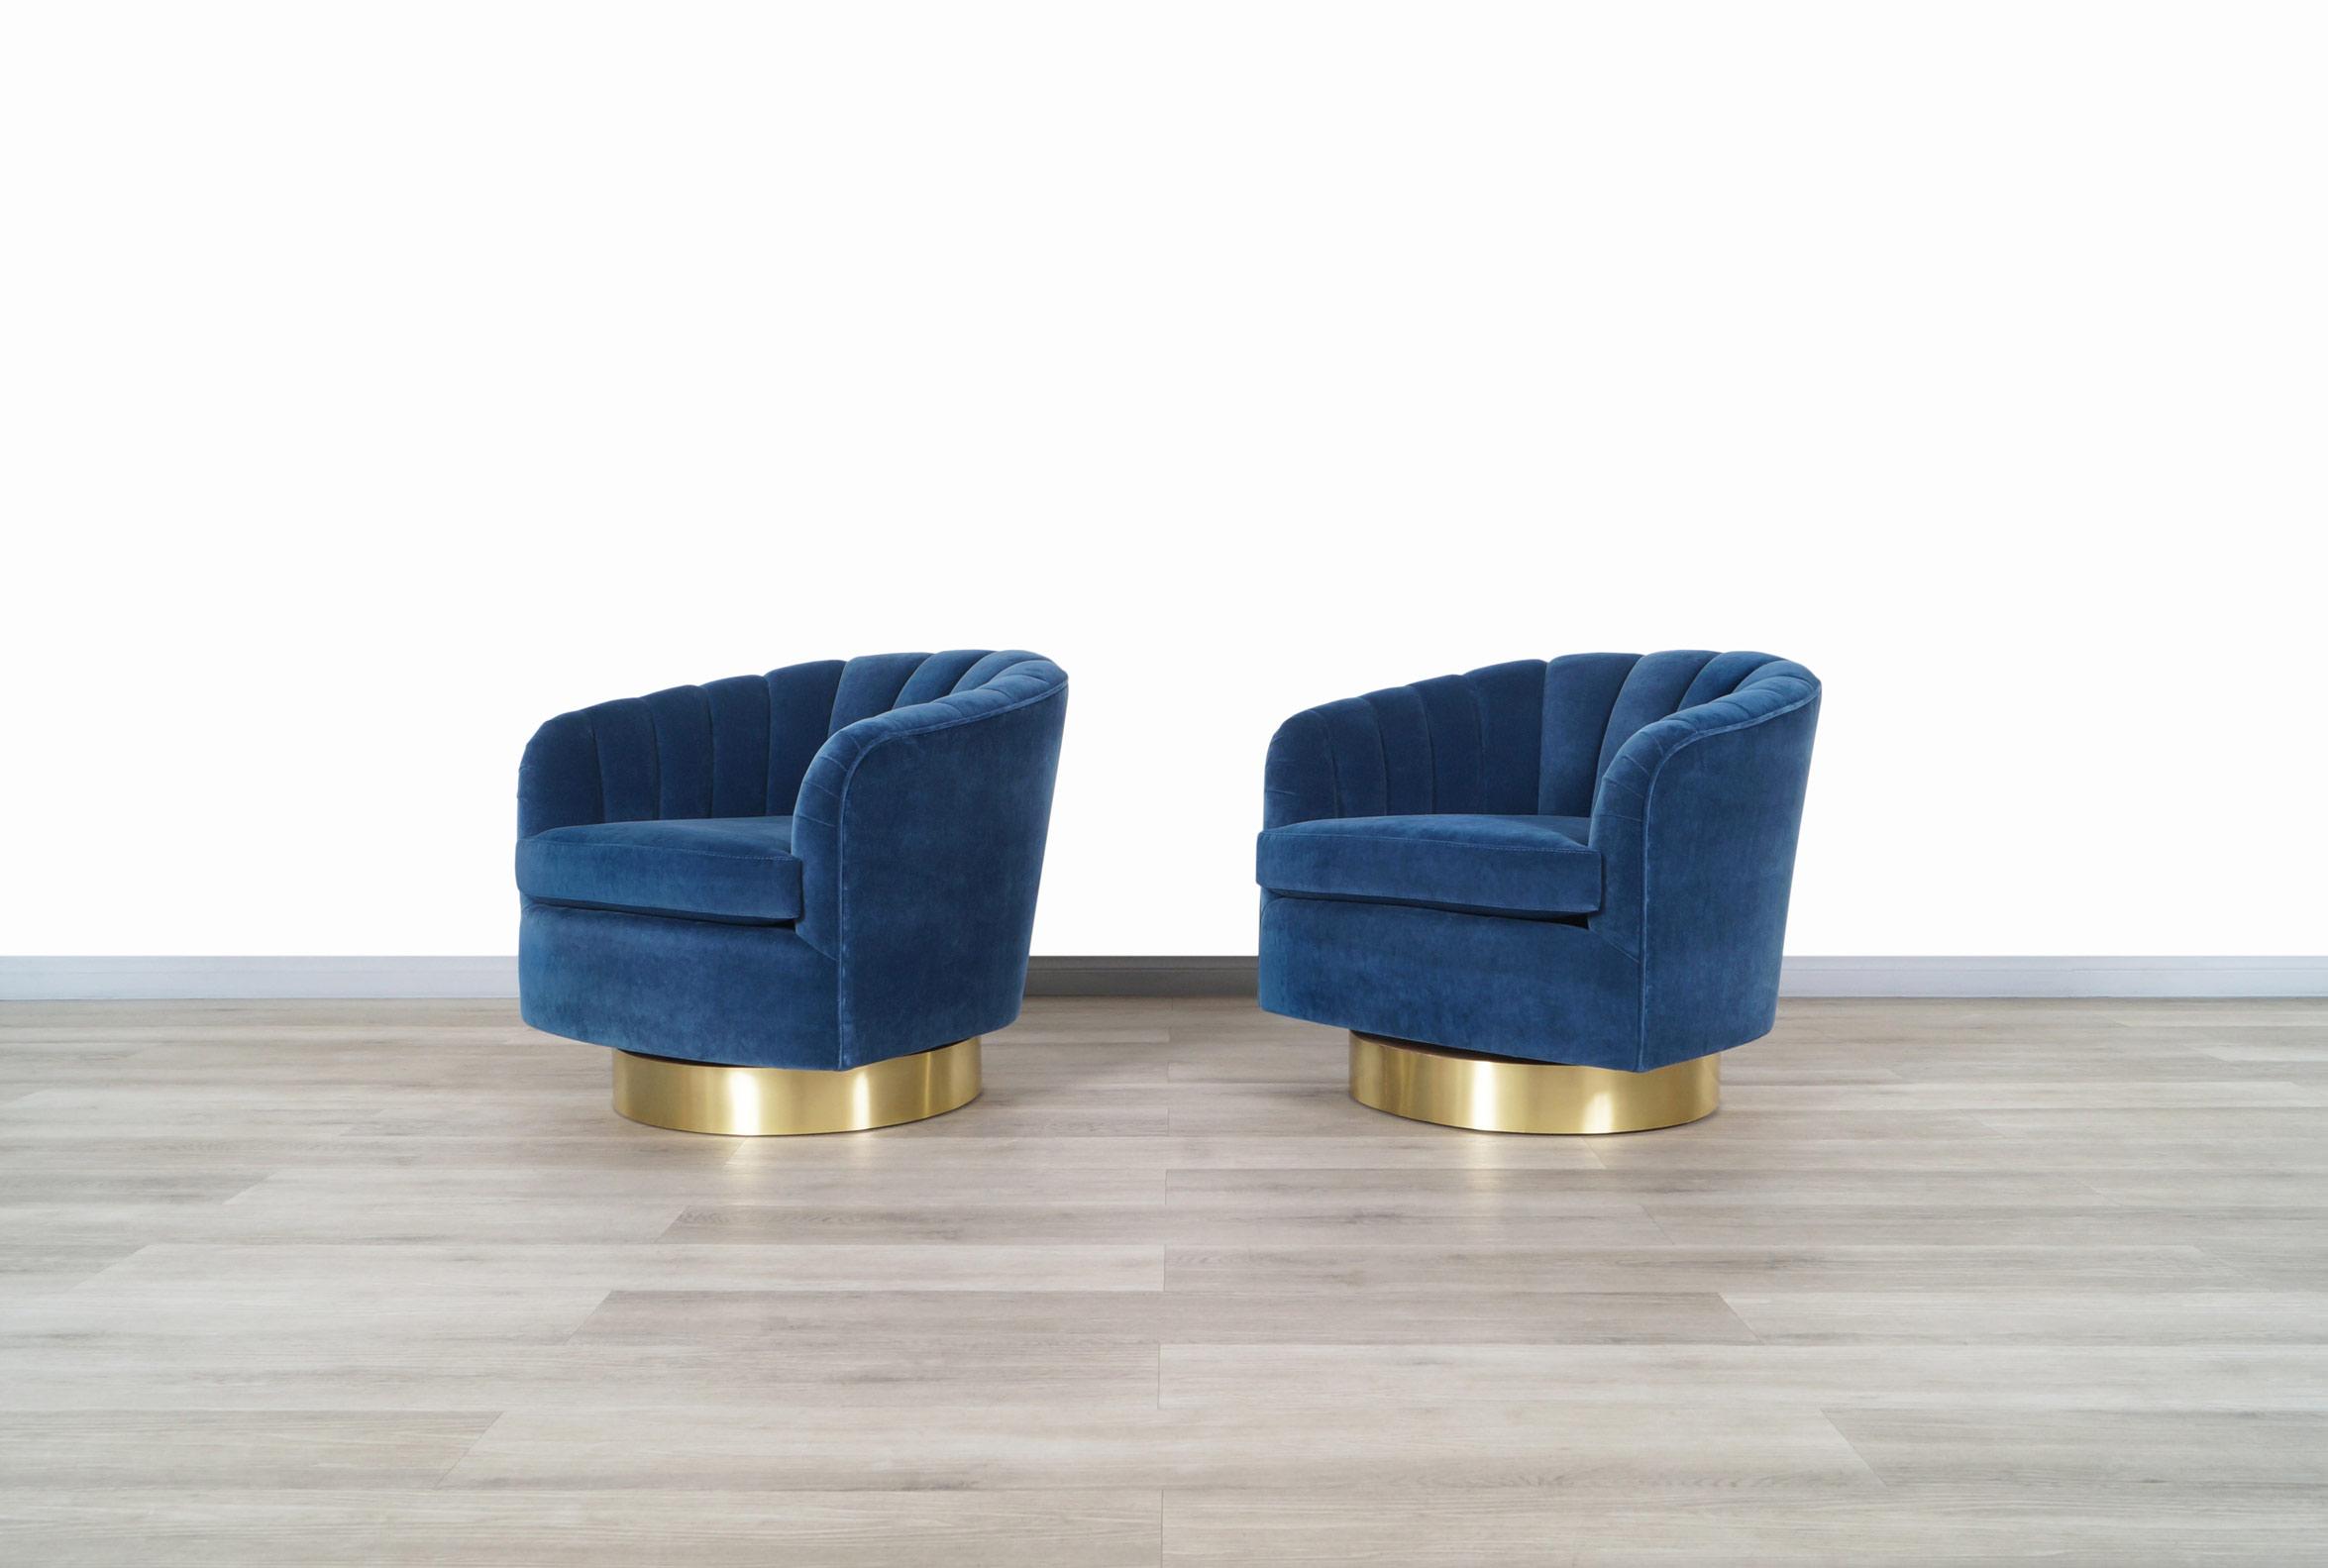 Vintage Brass Swivel Lounge Chairs by Milo Baughman